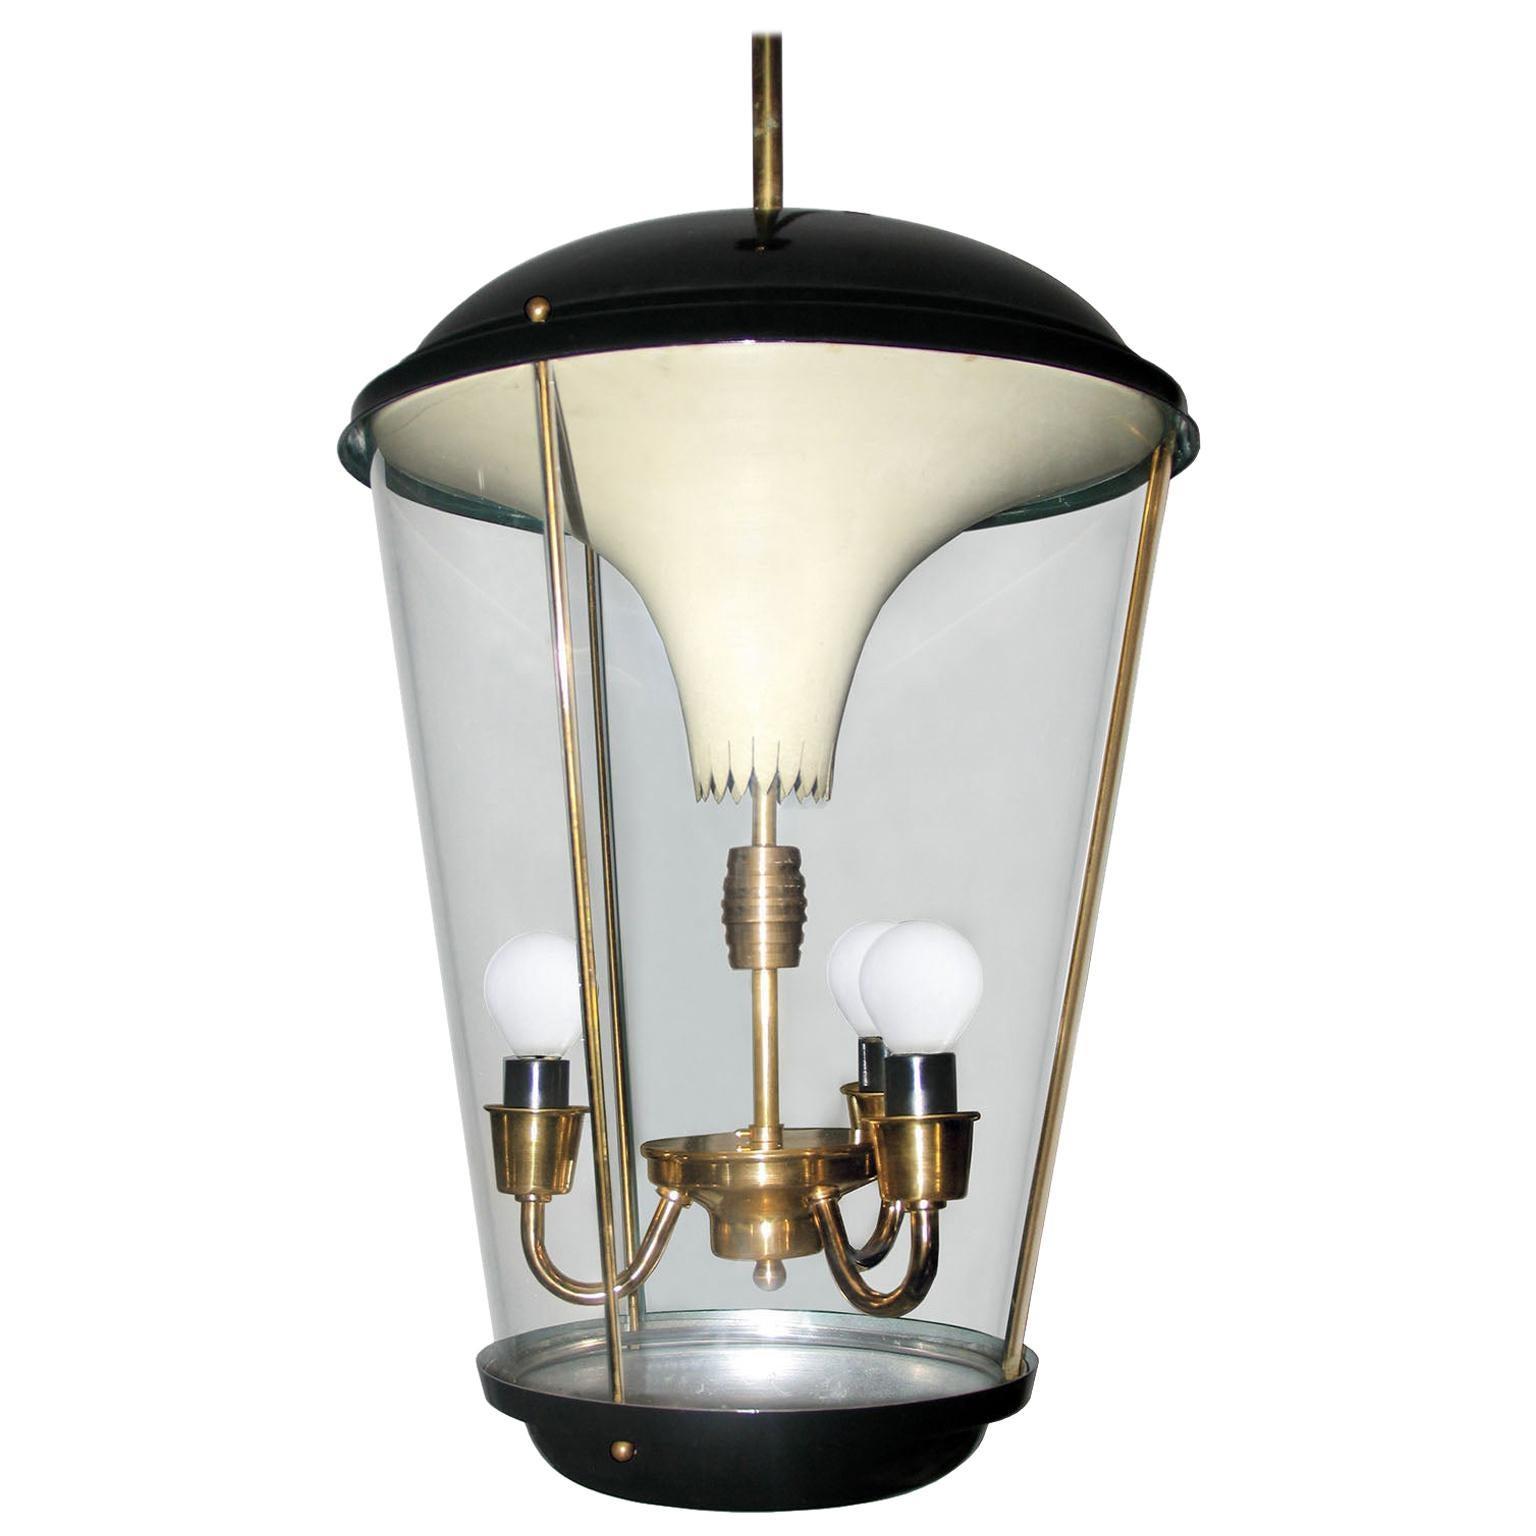 Lantern by Pietro Chiesa for Fontana Arte, Italy, 1940s